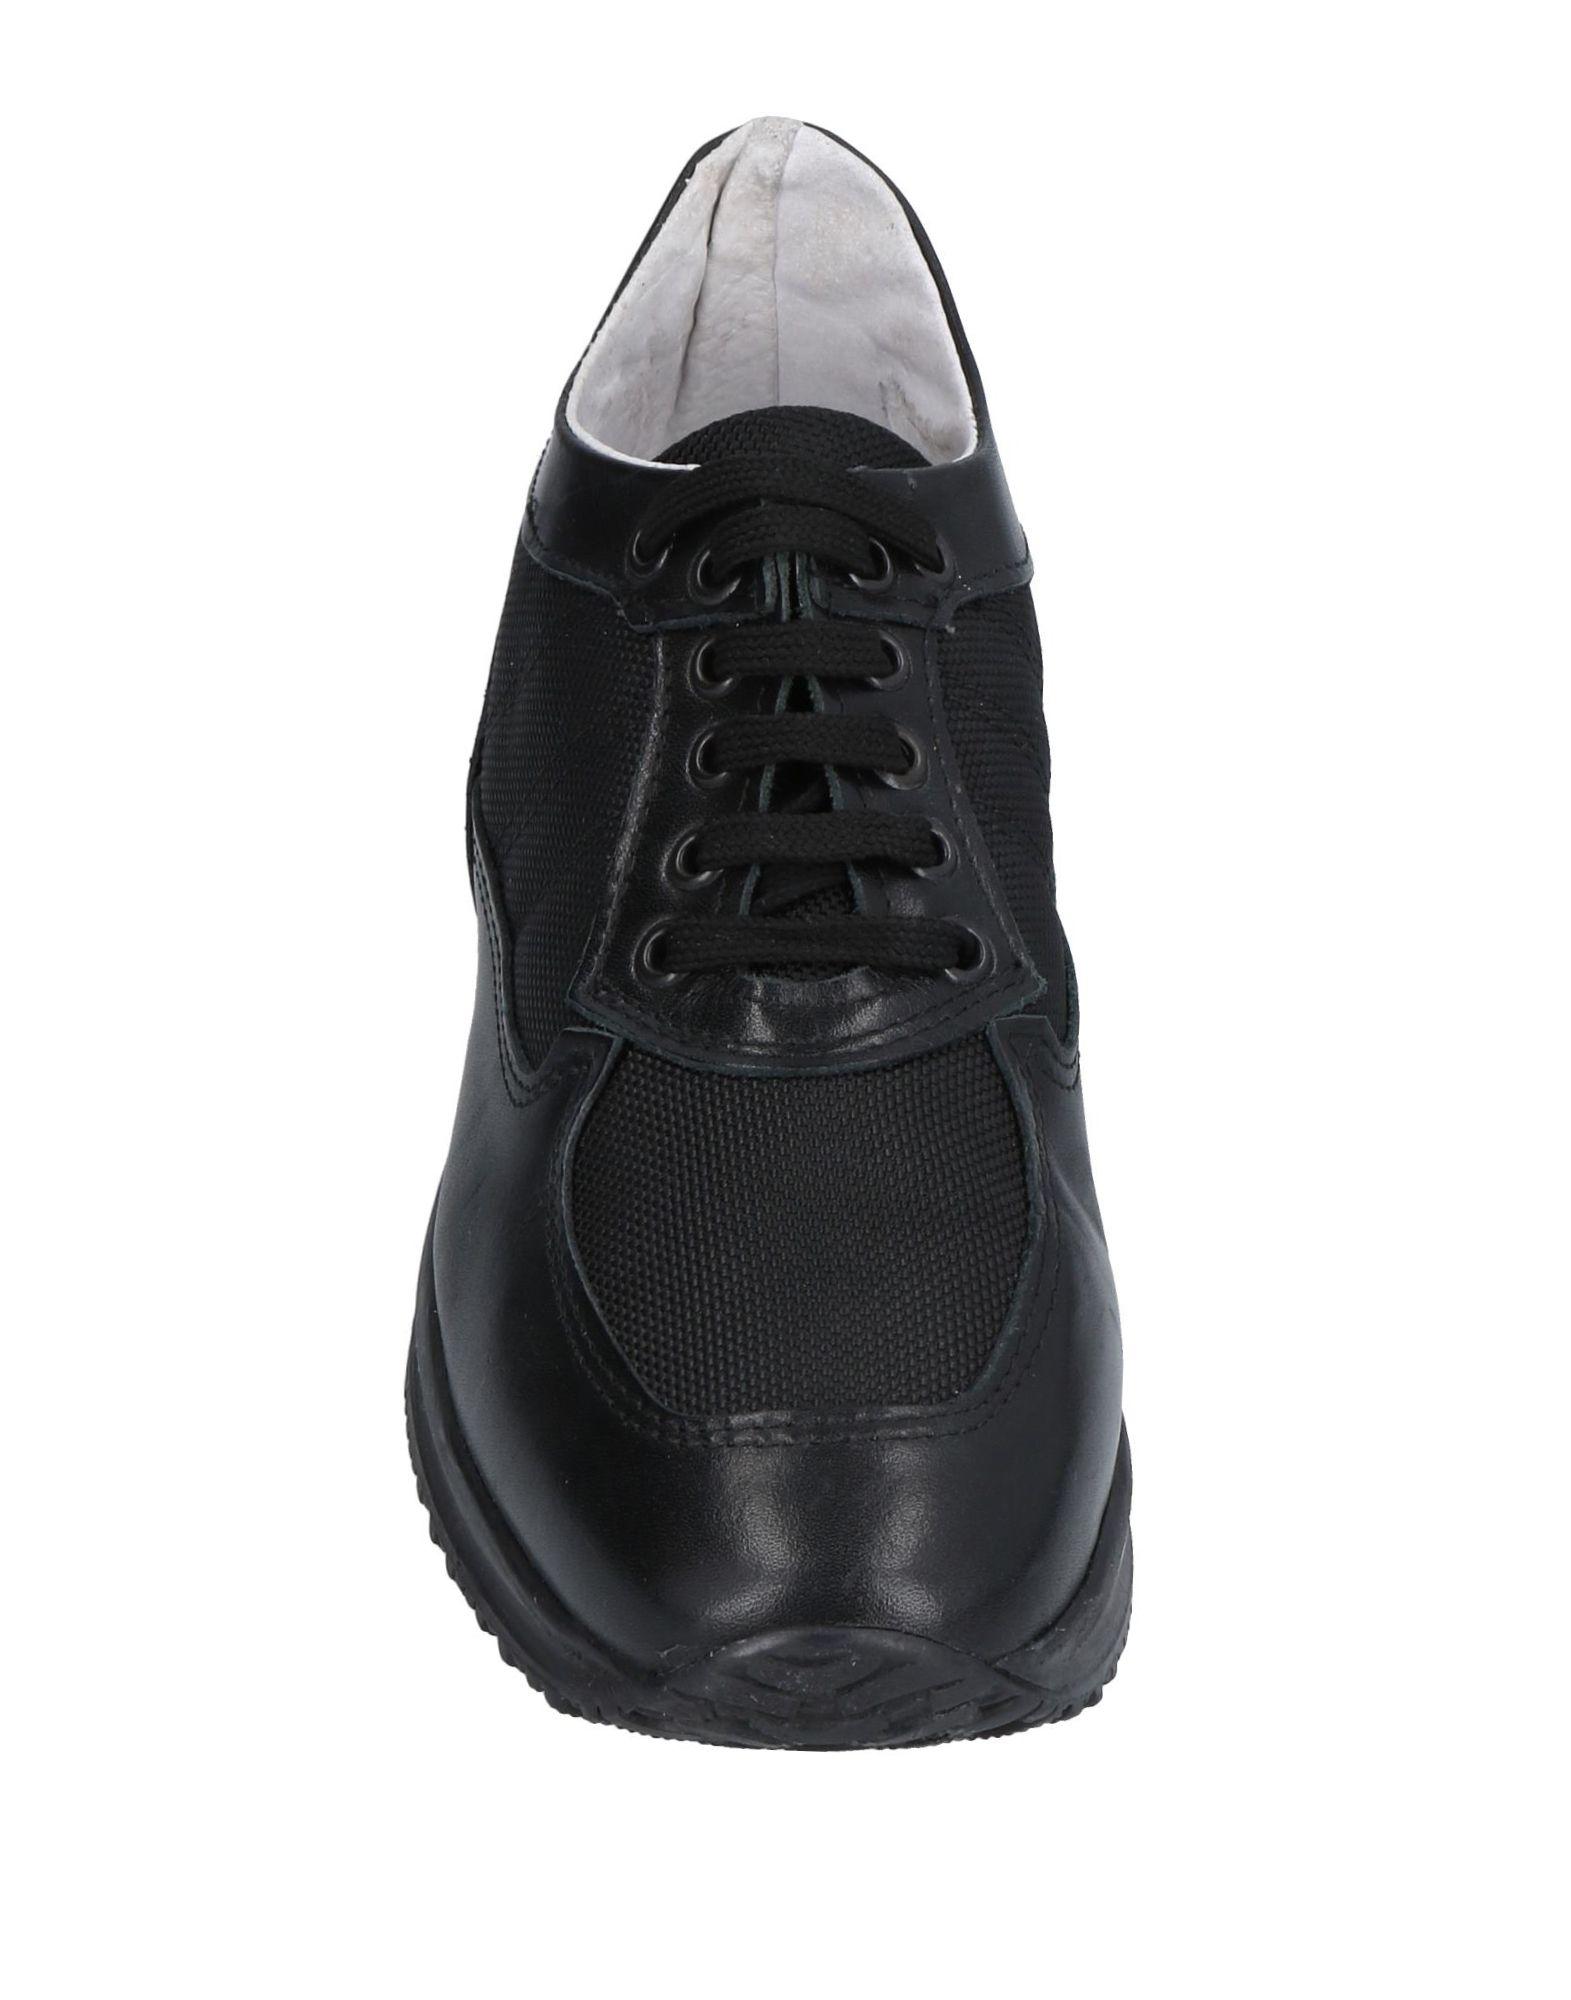 Roberto Della Croce Sneakers Damen  11460861BR Gute Gute 11460861BR Qualität beliebte Schuhe 3bce8d